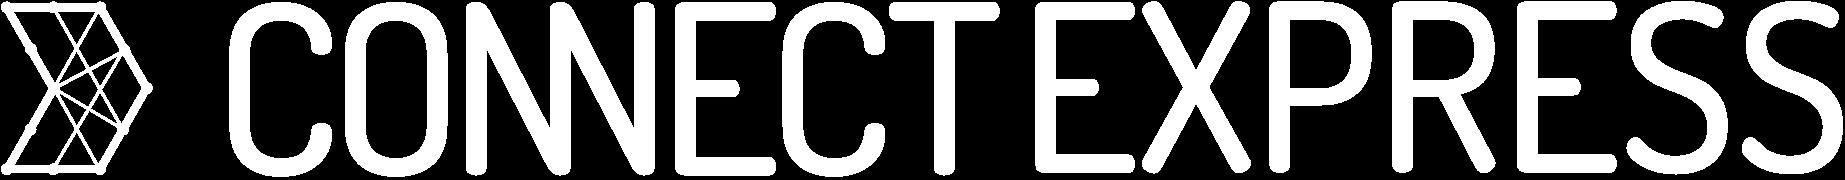 ConnectExpress logo